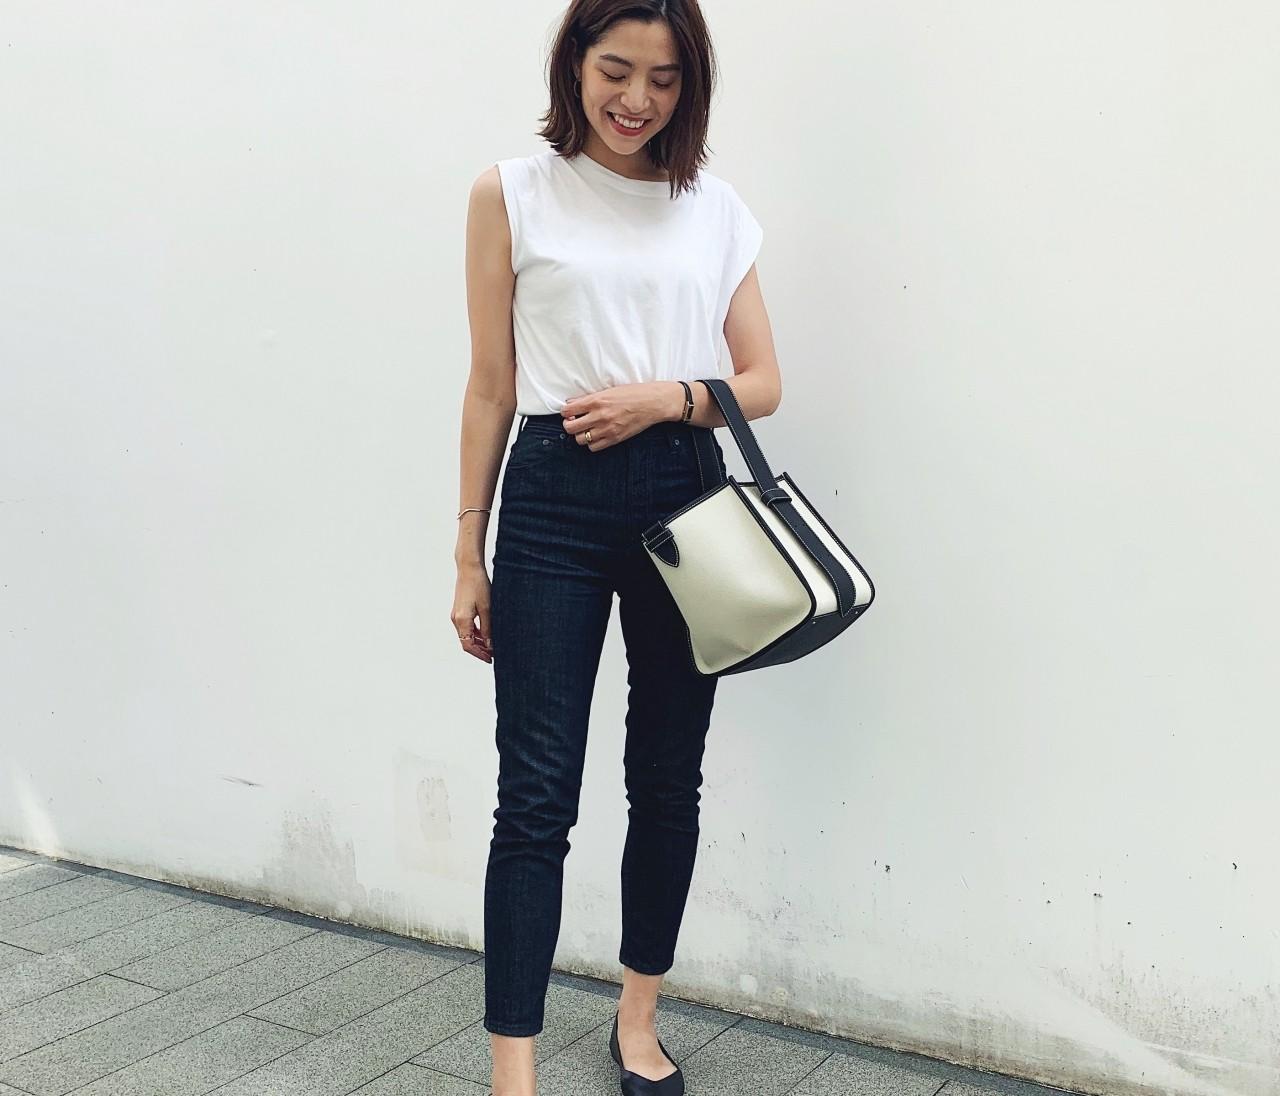 VASIC初購入。シンプルな服を引き立ててくれるバッグに一目惚れ。